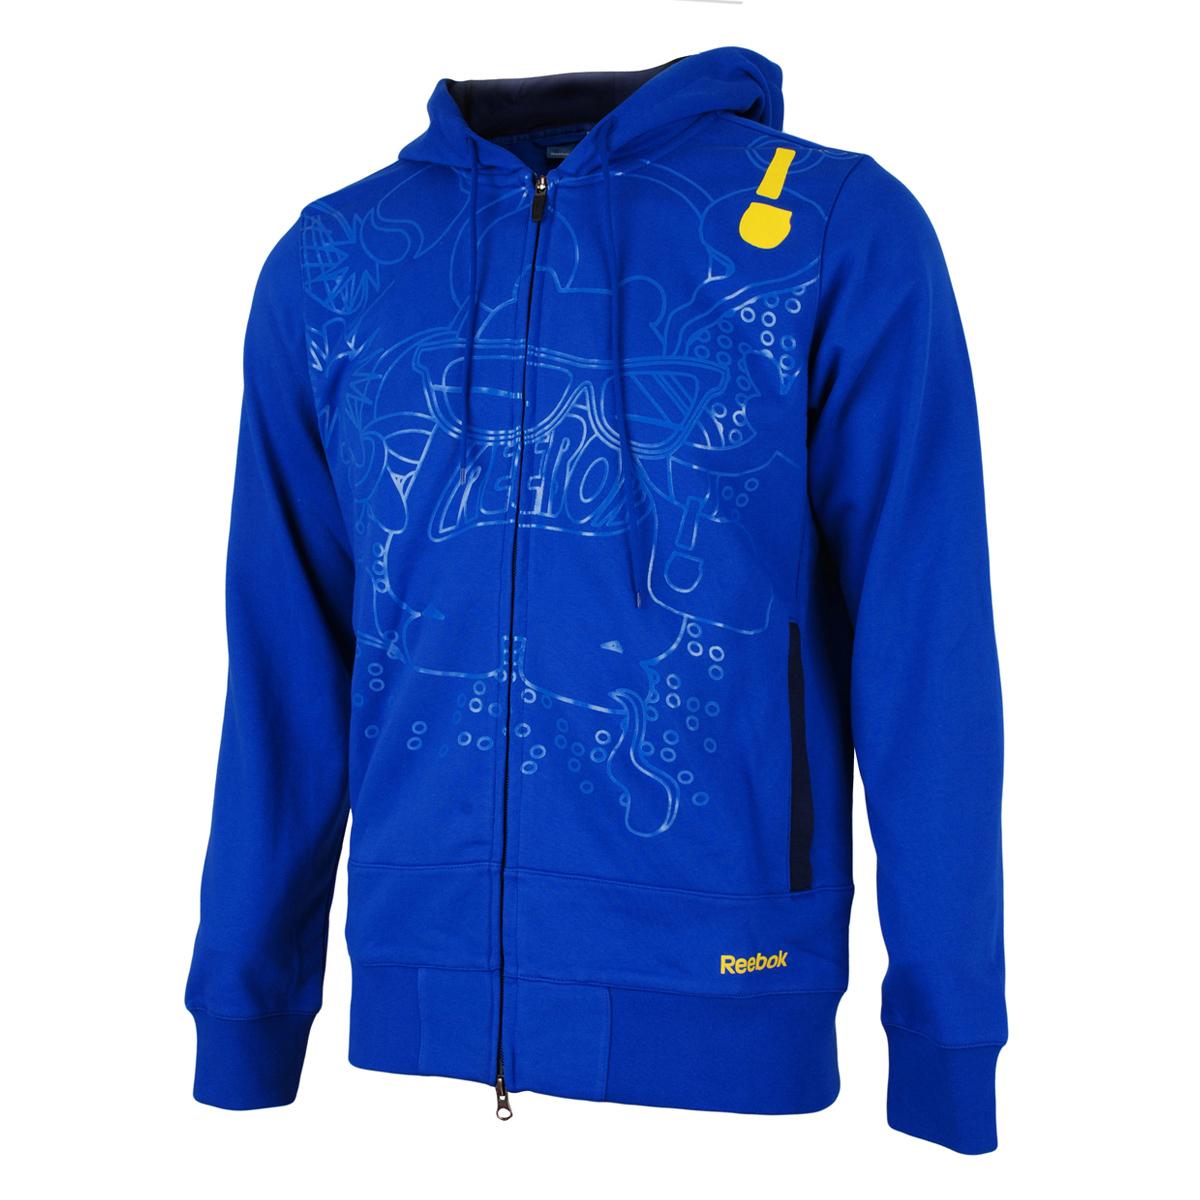 Спортивная куртка Reebok rb7422 K84118 Для мужчин Воротник с капюшоном